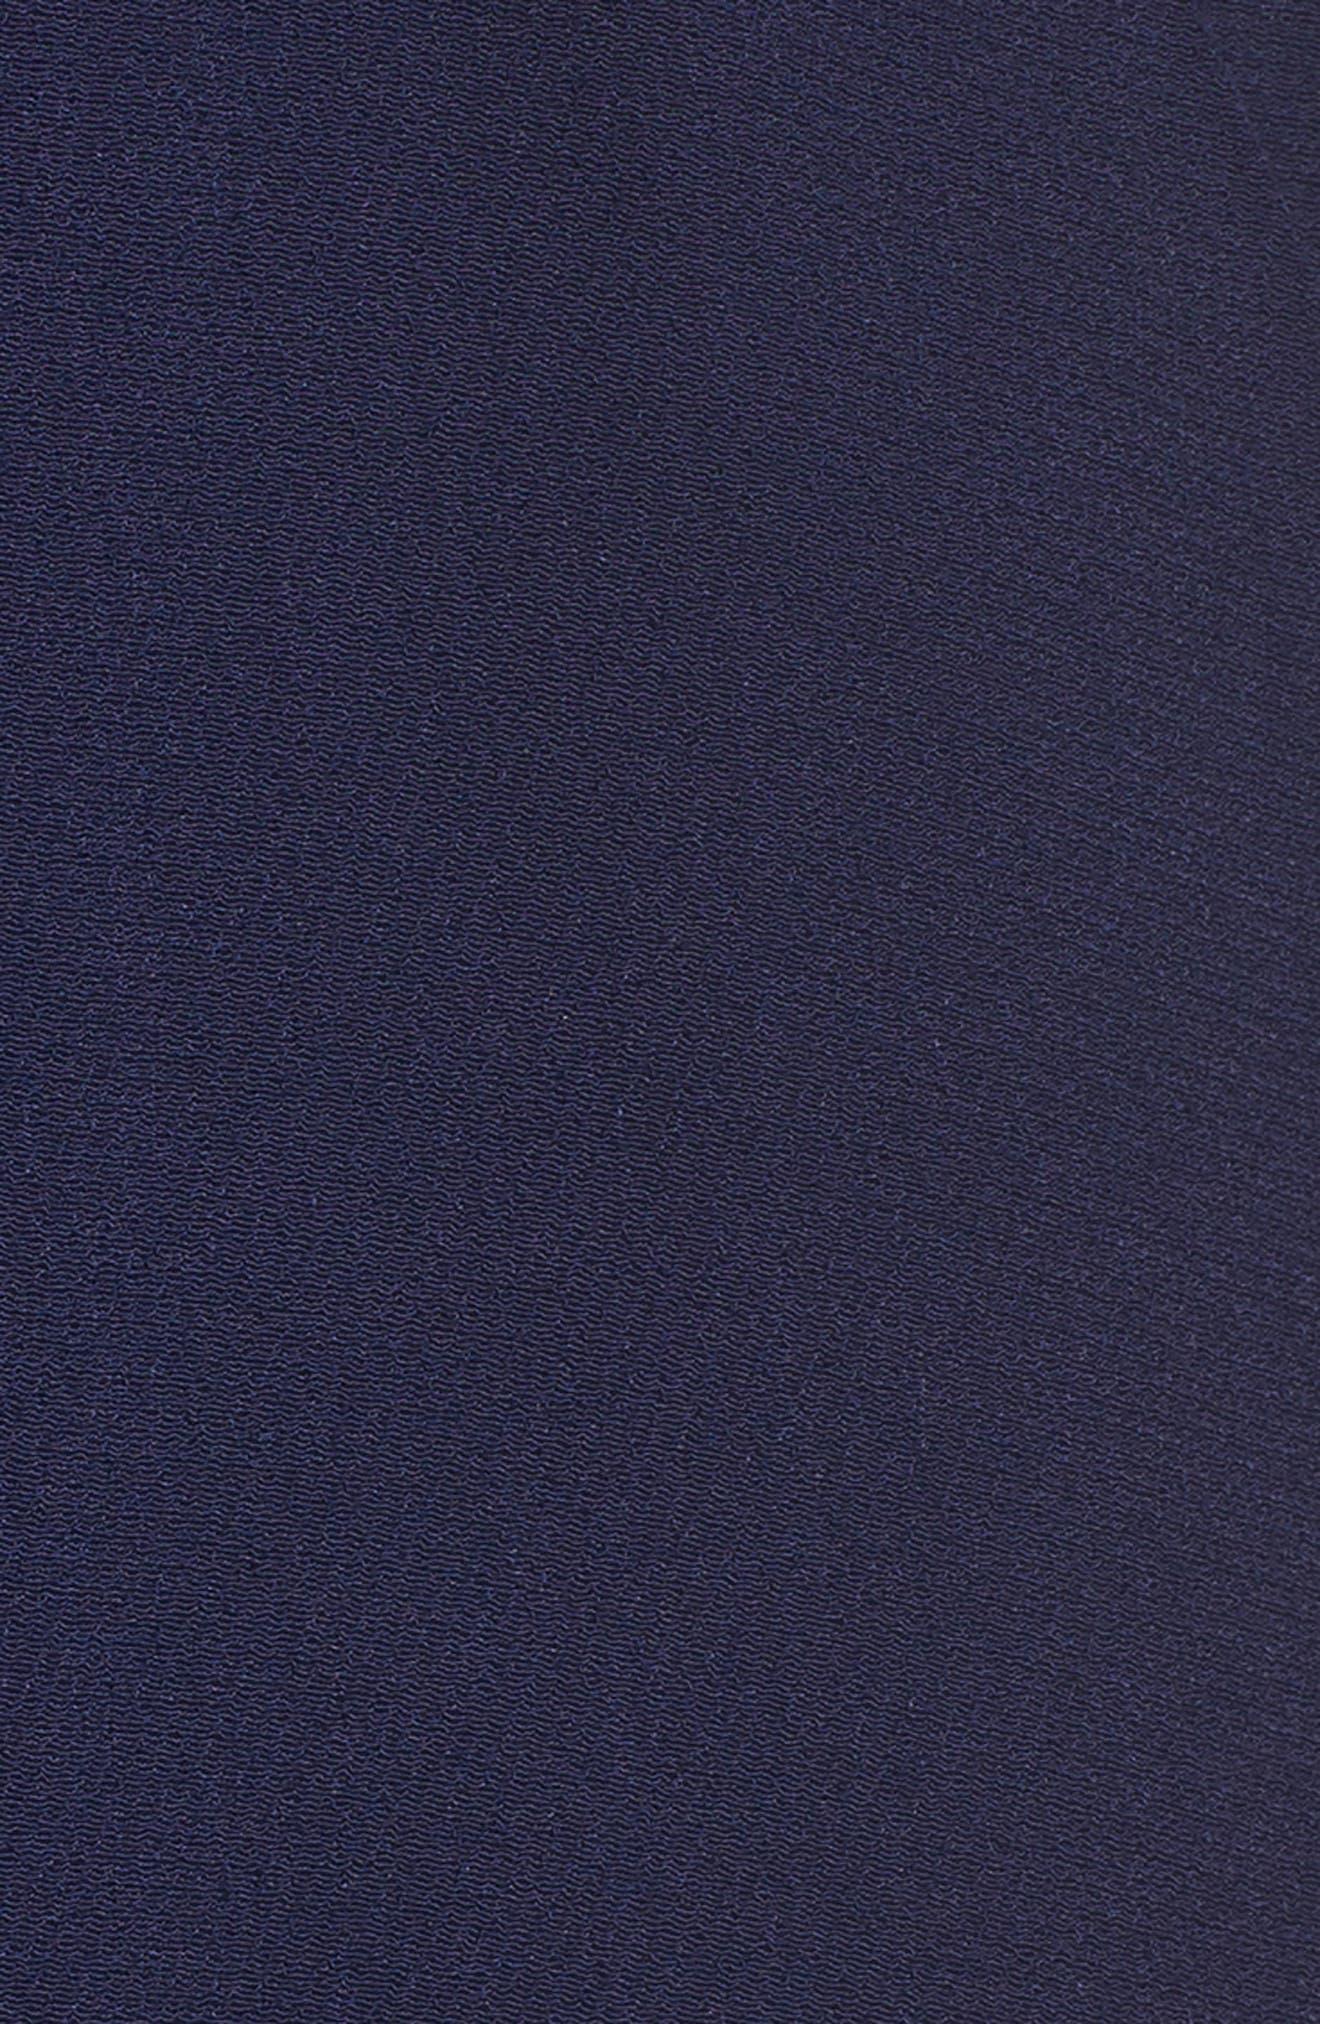 Drew Crepe Shirtdress,                             Alternate thumbnail 5, color,                             410